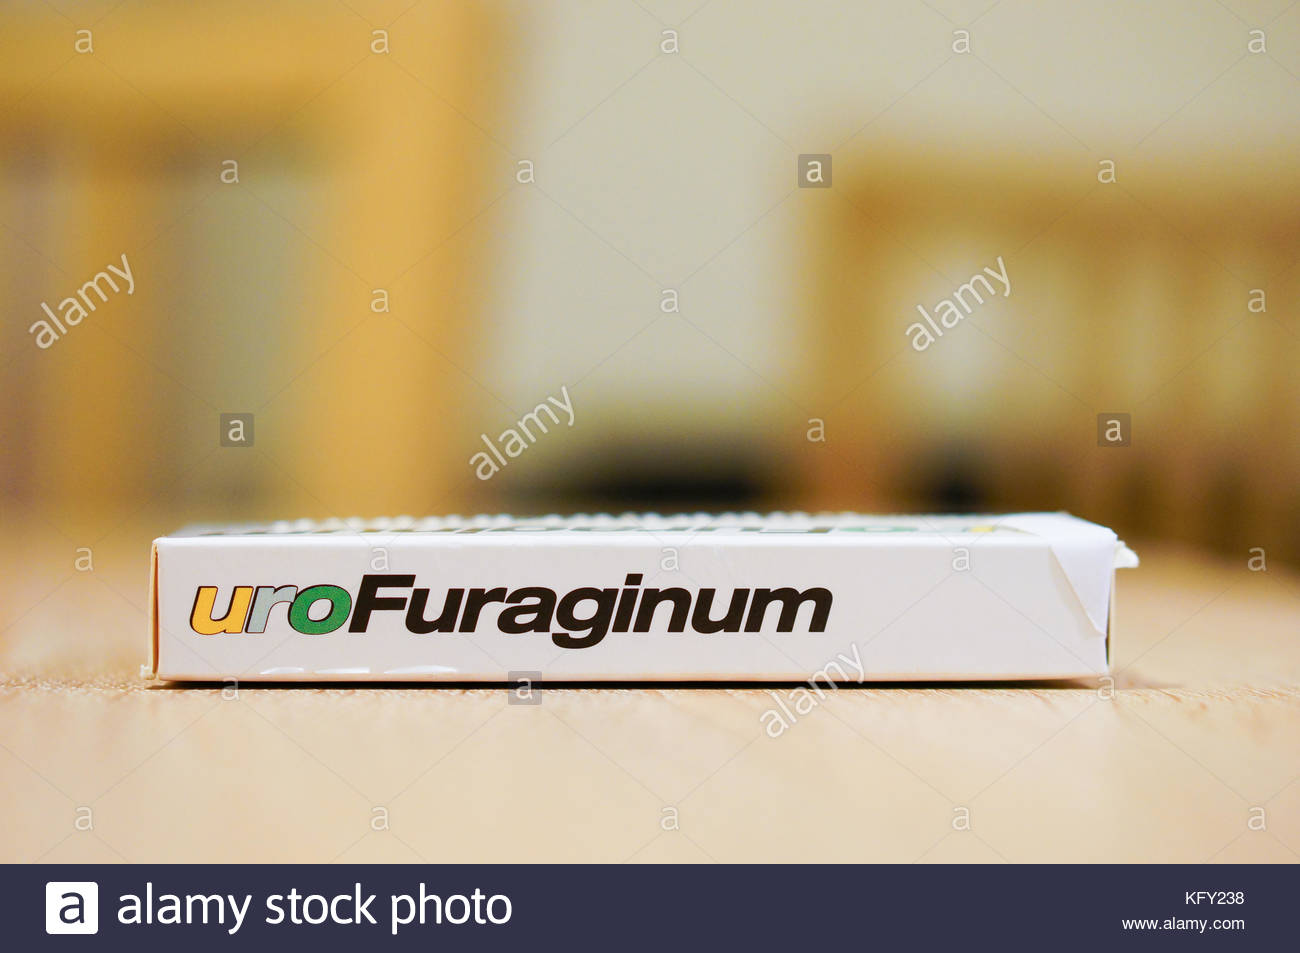 POZNAN, POLAND - DECEMBER 16, 2015: Uro Furaginum medicine in a box on wooden table - Stock Image